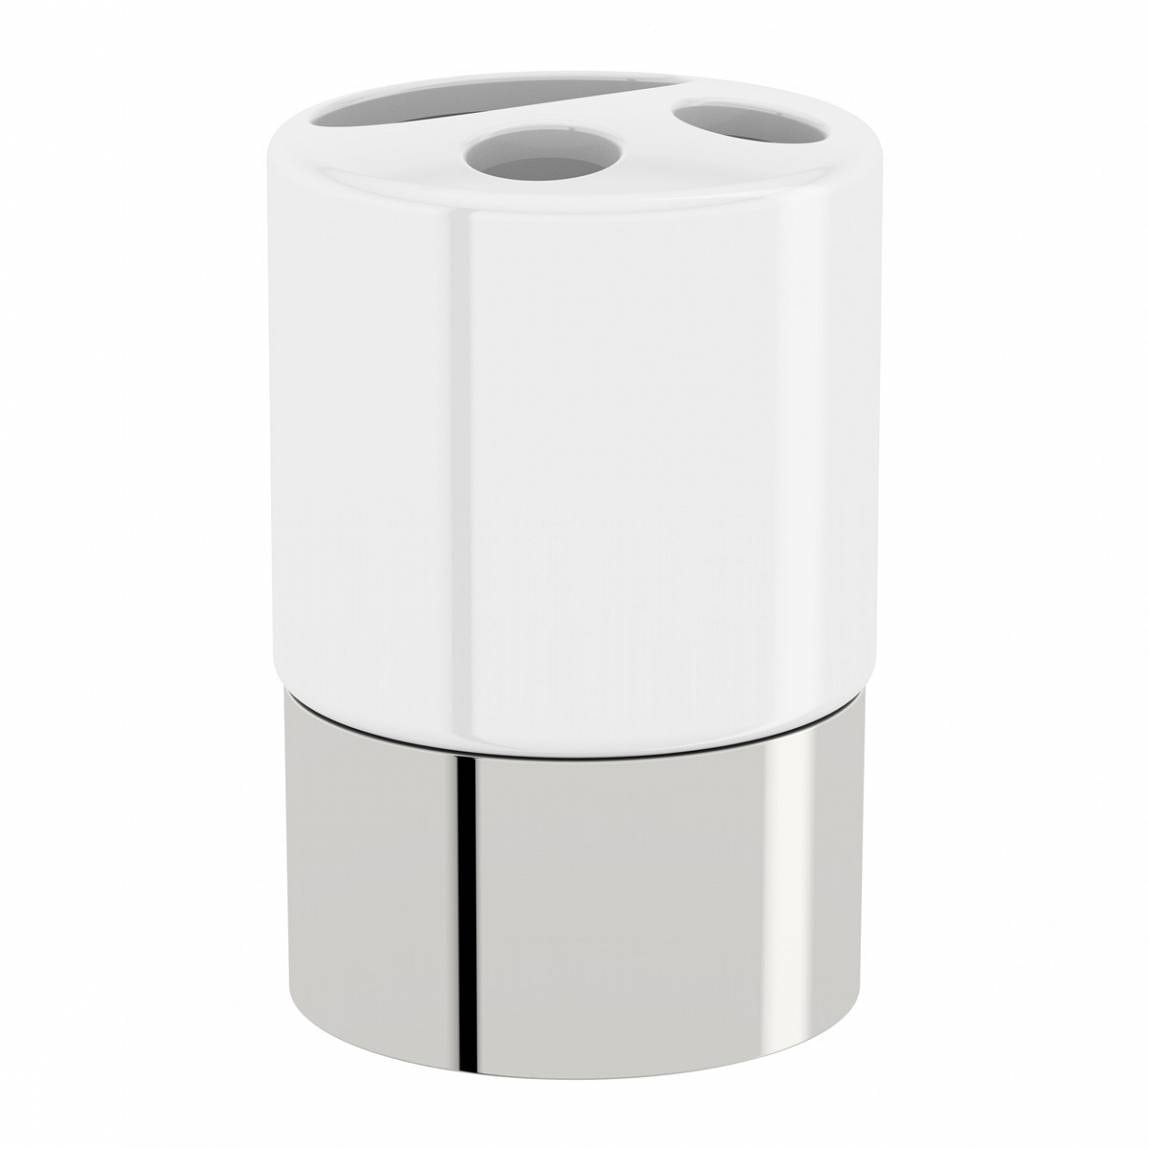 Options Freestanding Ceramic Toothbrush Holder